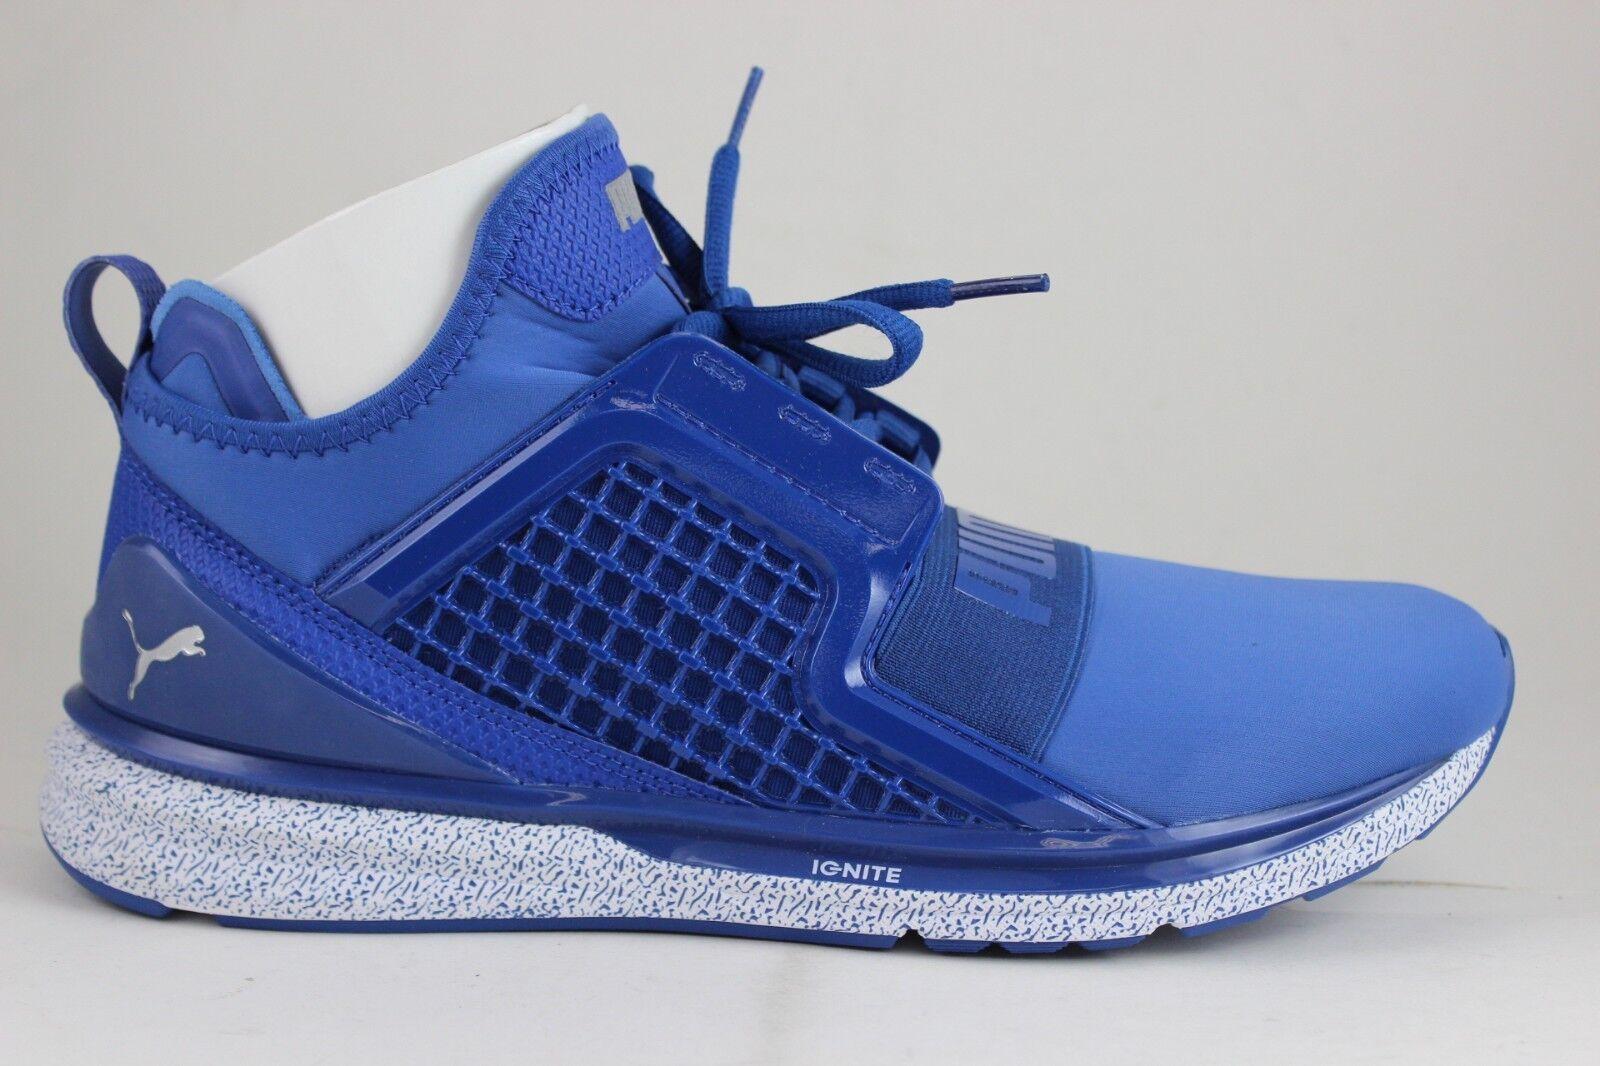 Puma Homme Ignite Limitless Training Sneakers True Bleu 18964103 Brand New